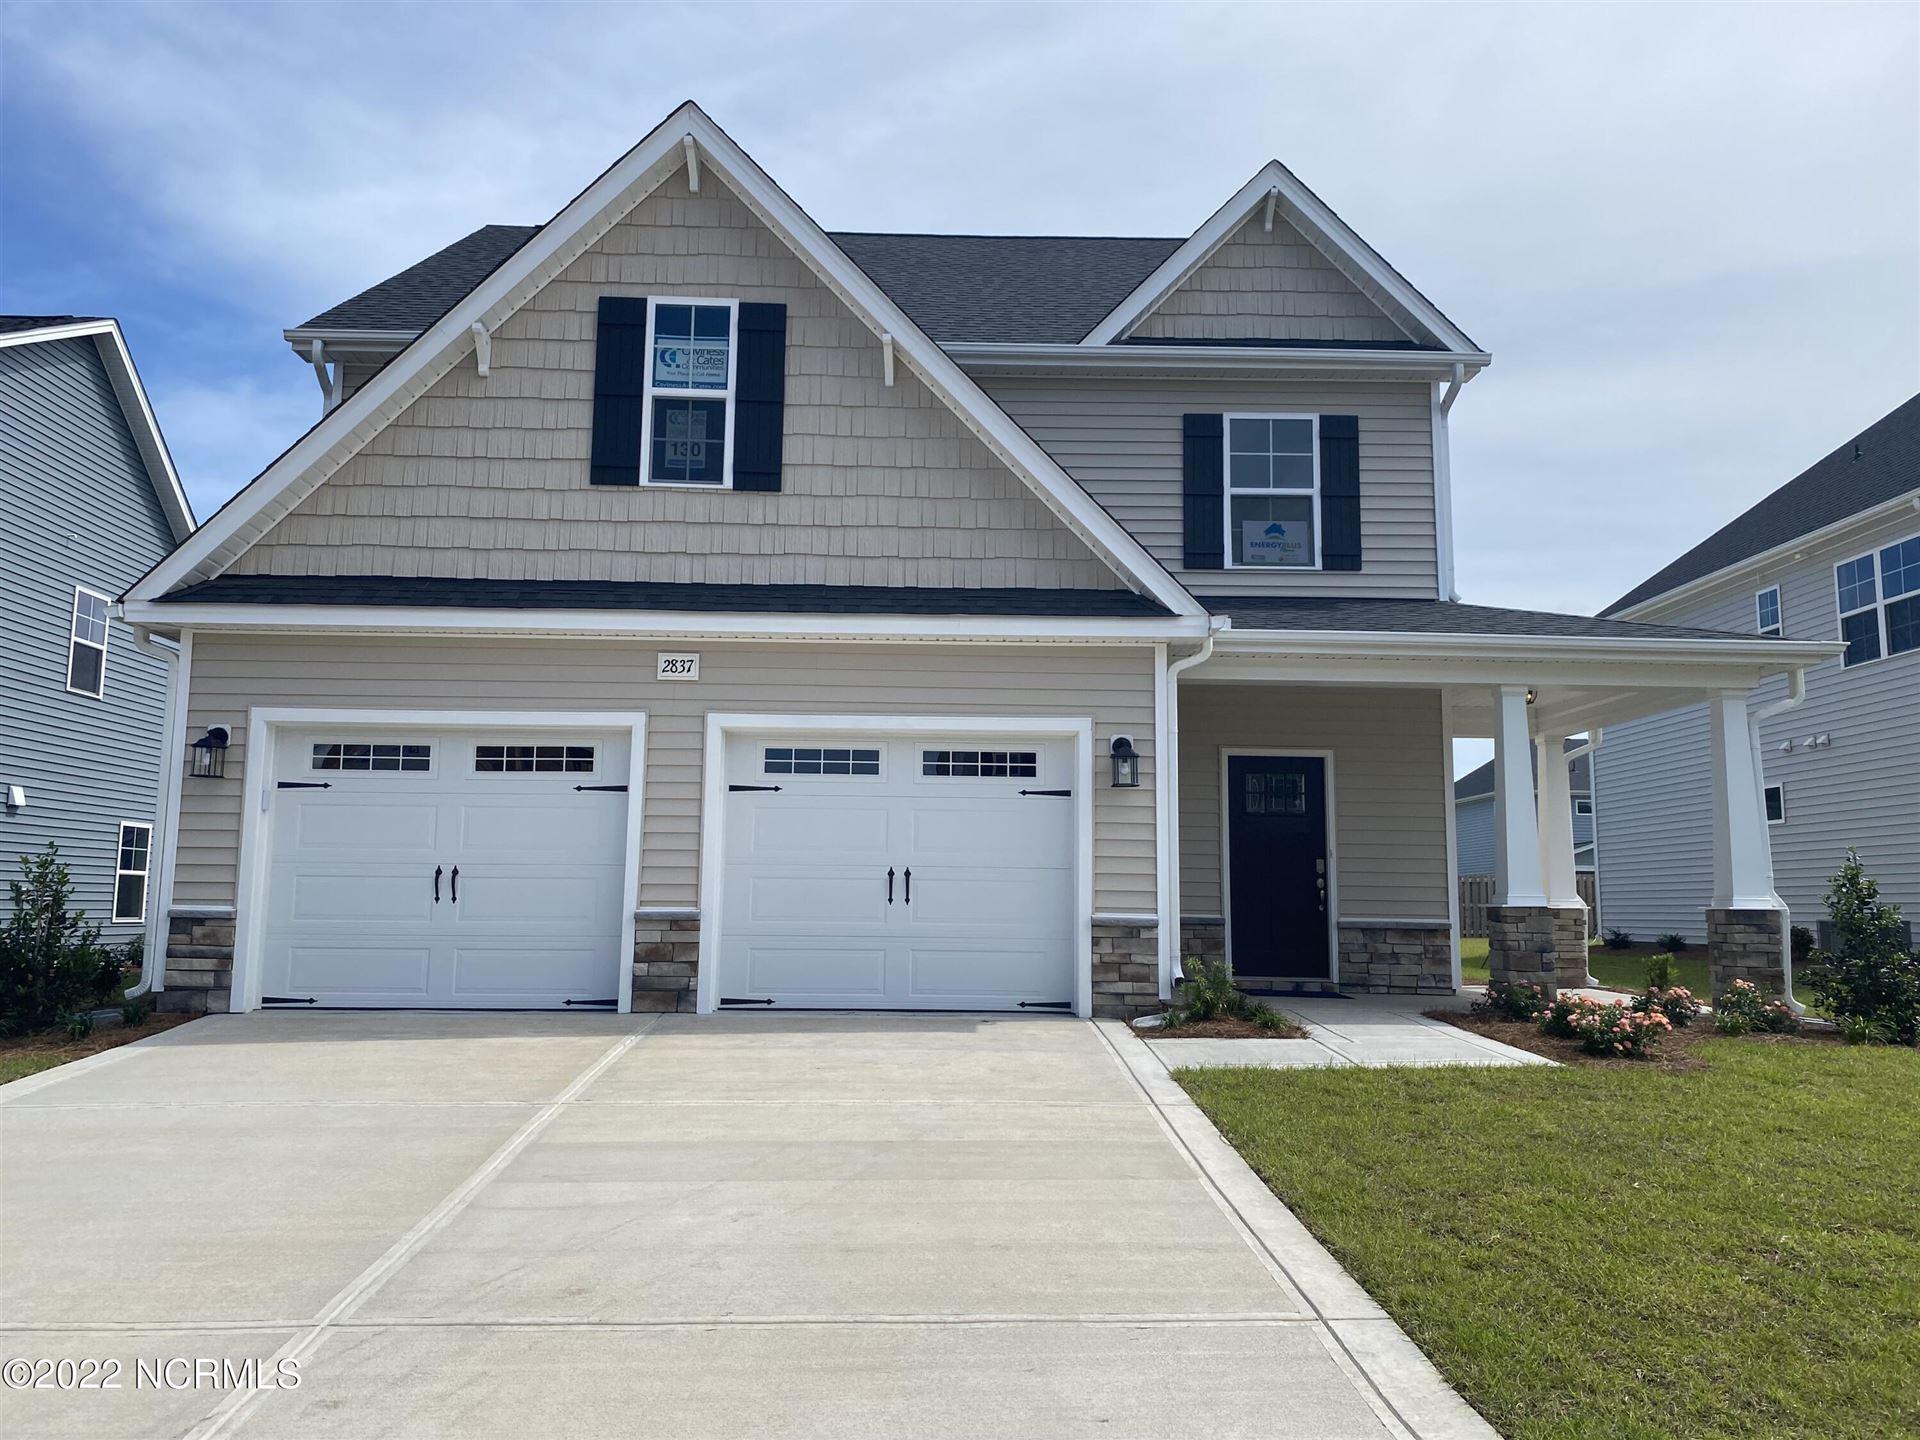 Photo of 2837 Longleaf Pine Circle, Leland, NC 28451 (MLS # 100295064)